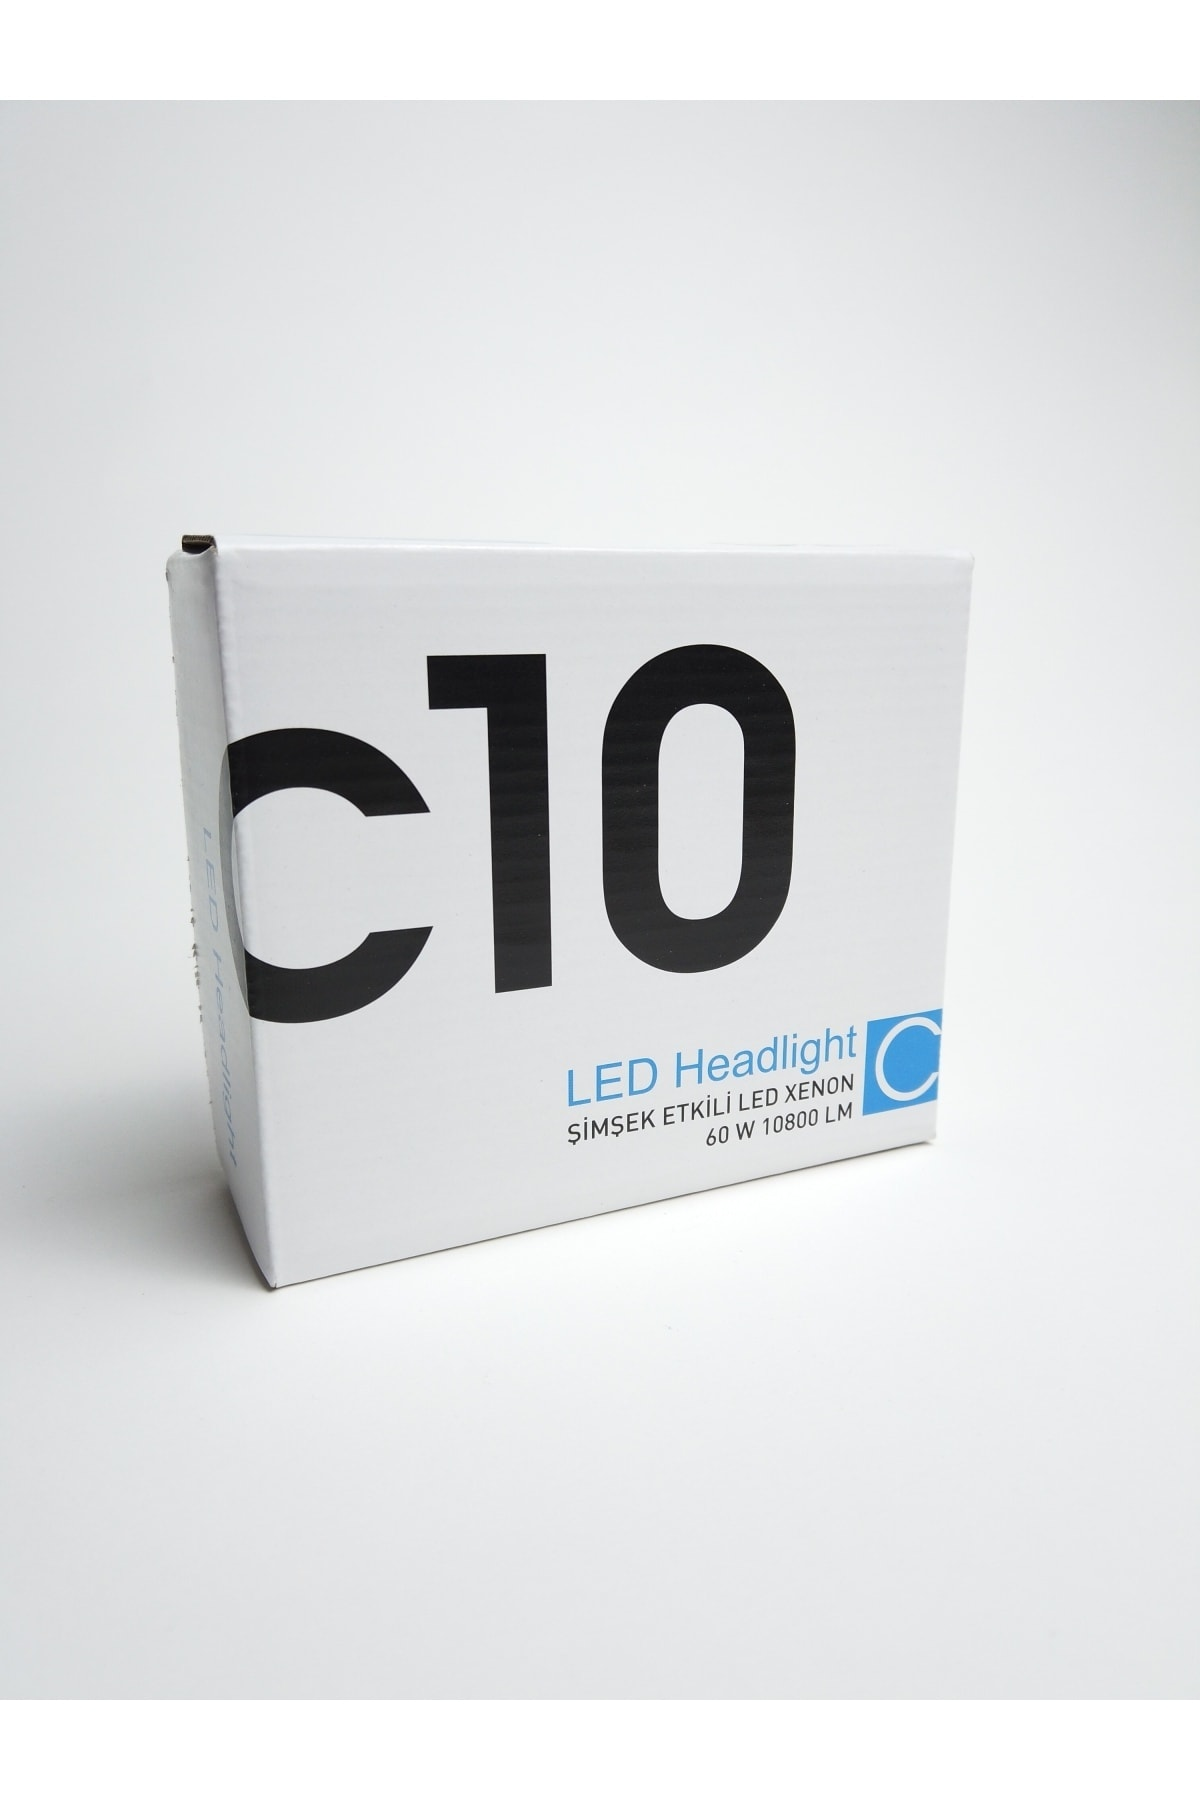 C10 H7 Led Xenon Led Zenon Far Ampulü Yeni Nesil Şimşek Etkili 2